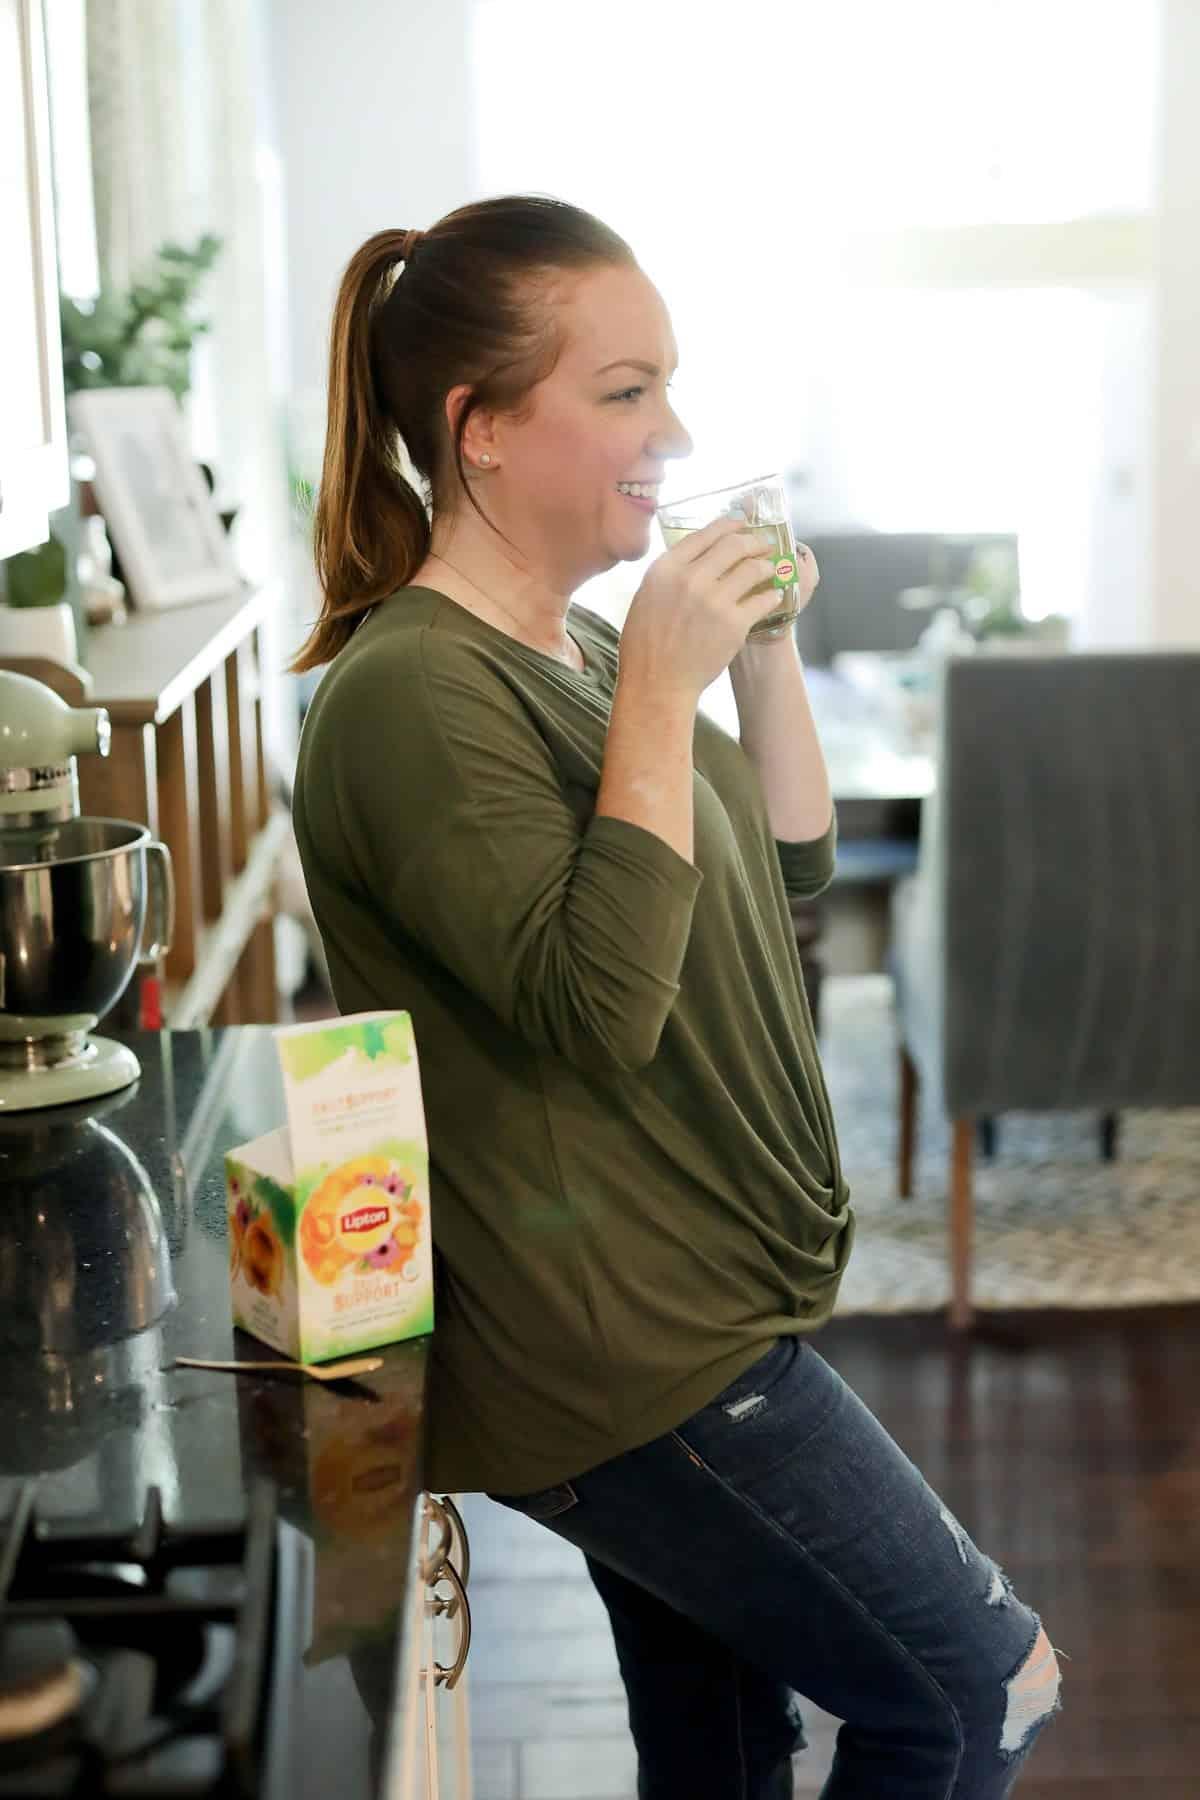 a woman drinking lipton tea in her kitchen